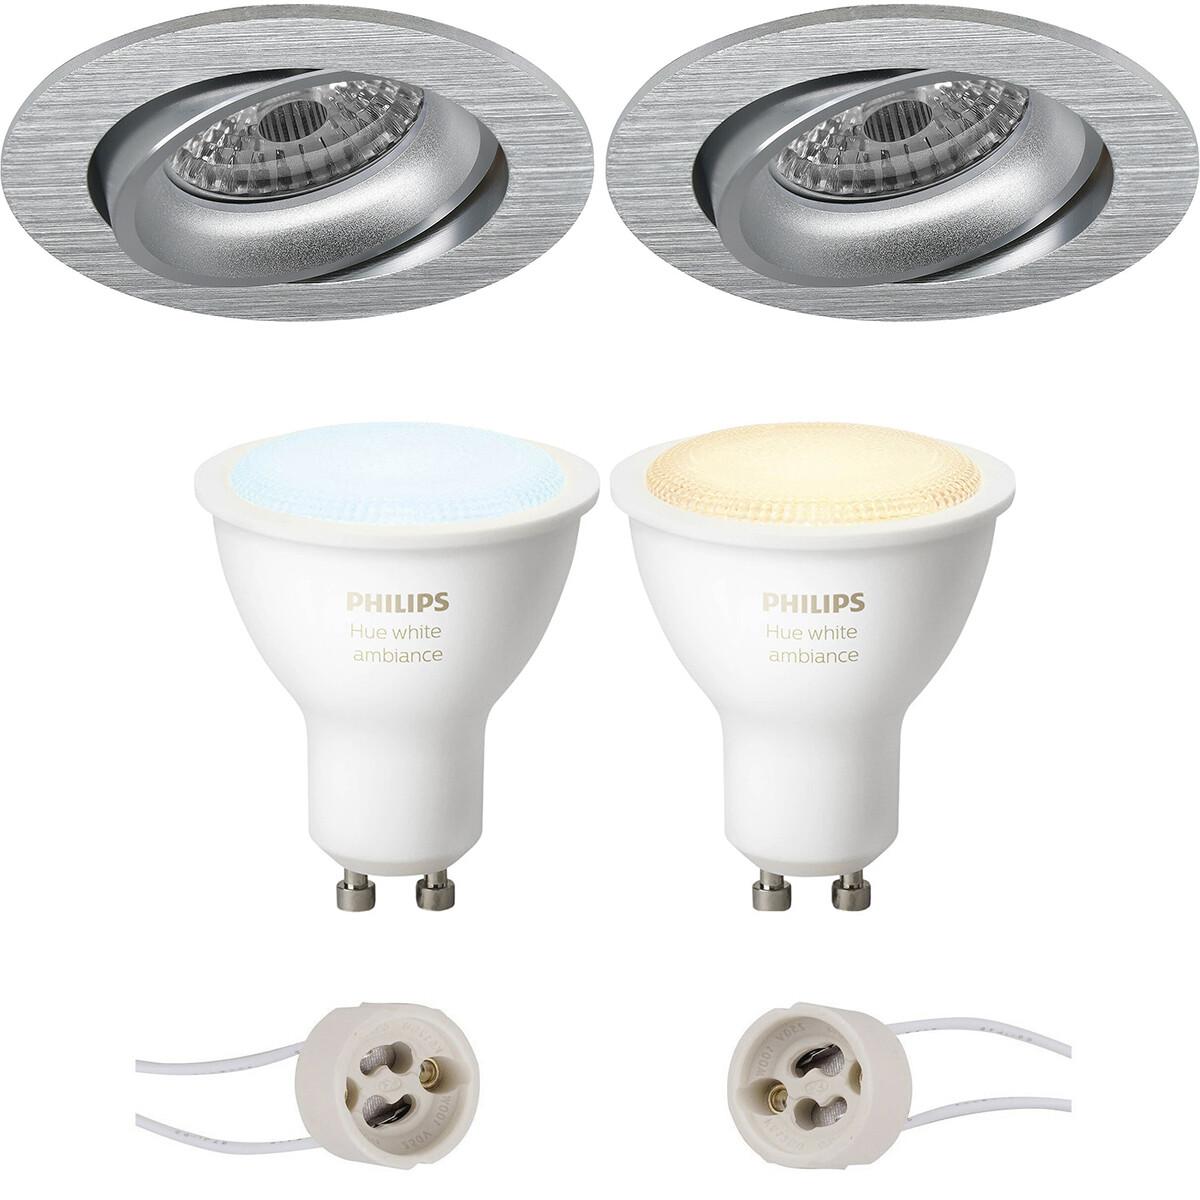 Pragmi Delton Pro - Inbouw Rond - Mat Zilver - Kantelbaar - Ø82mm - Philips Hue - LED Spot Set GU10